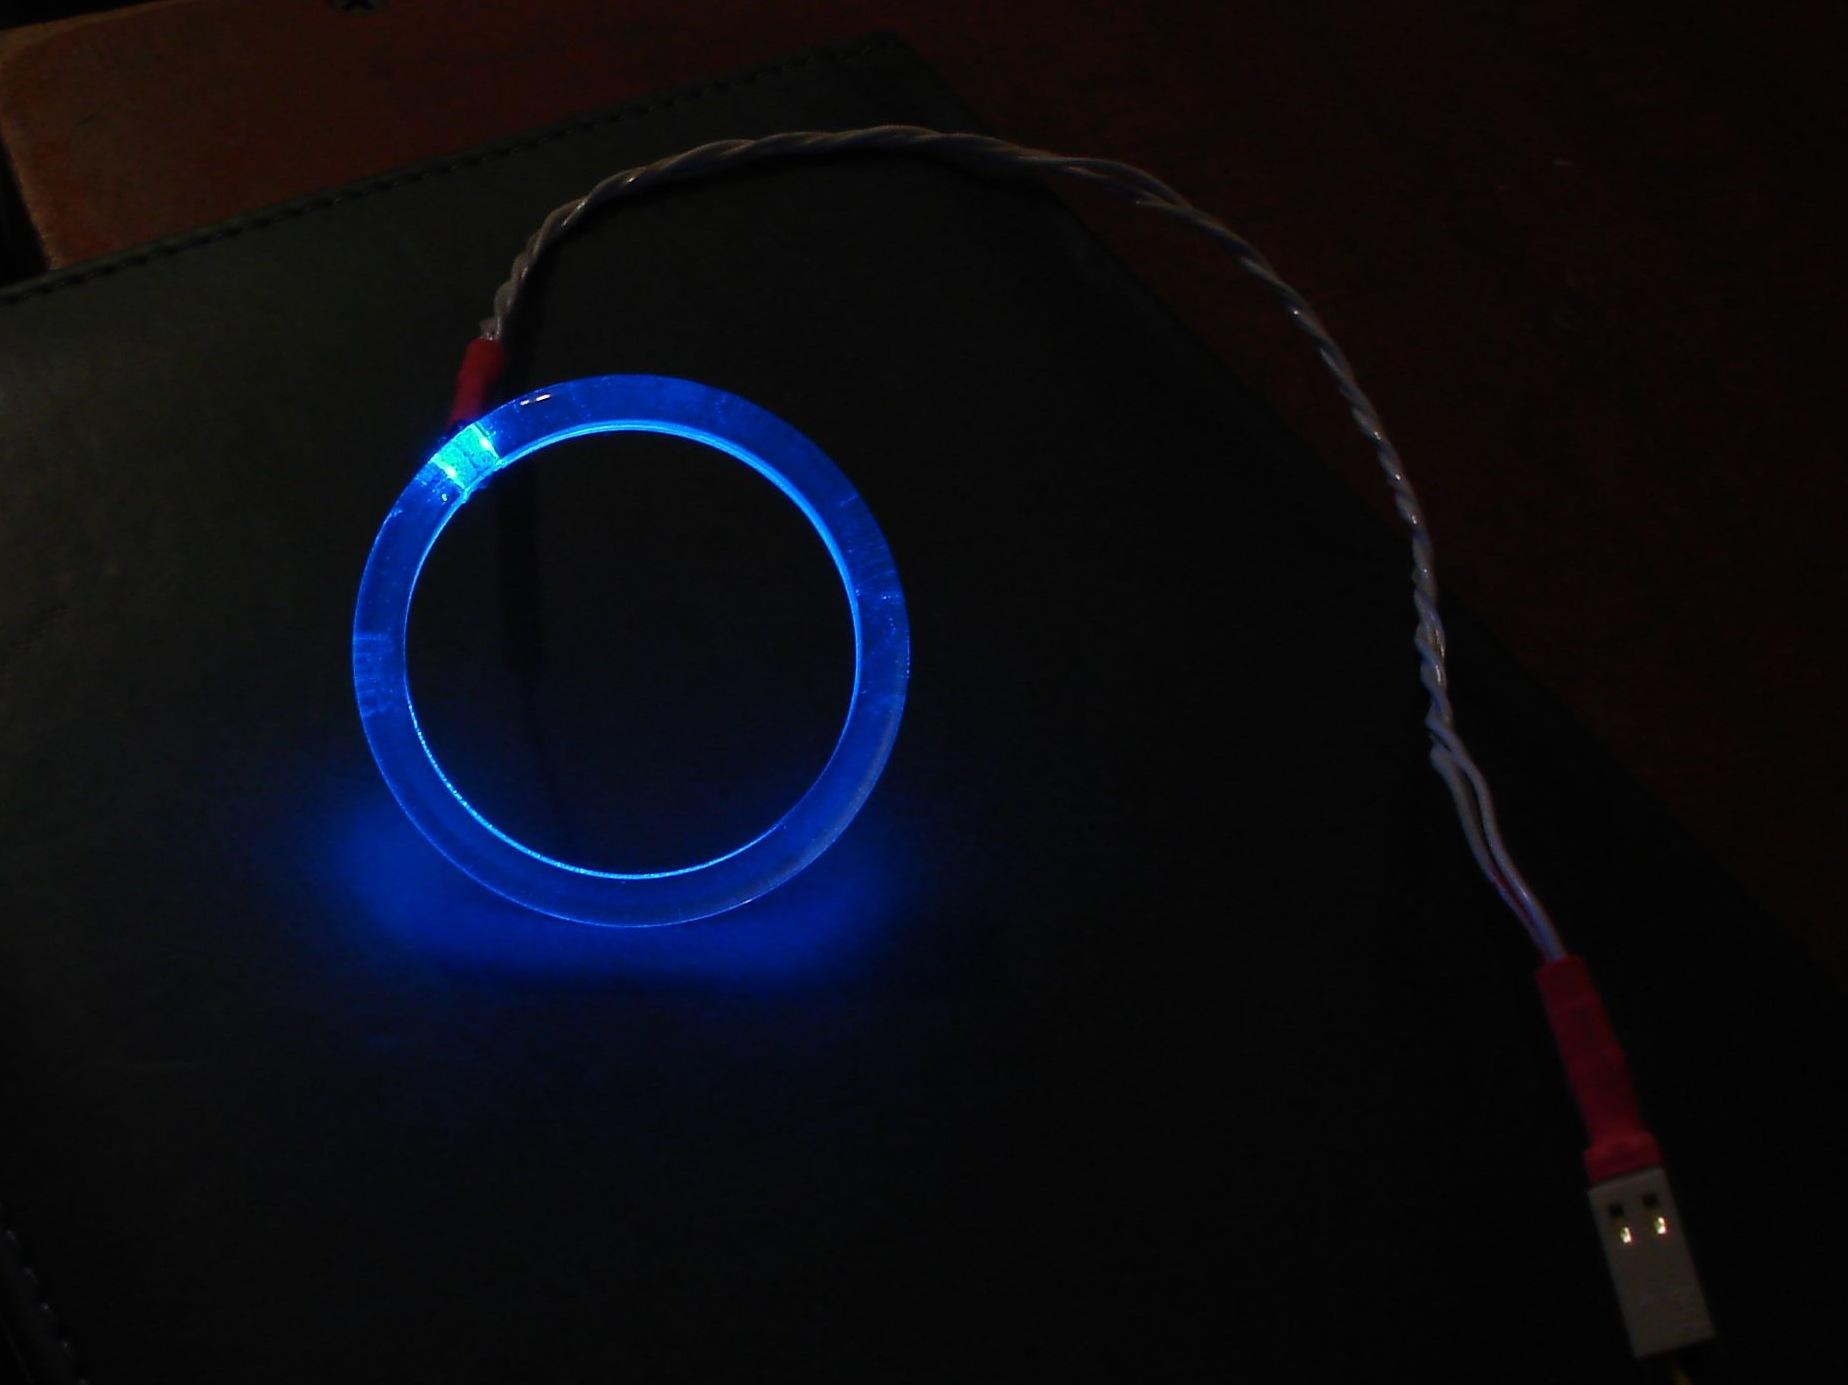 Подсветка замка зажигания своими руками видео